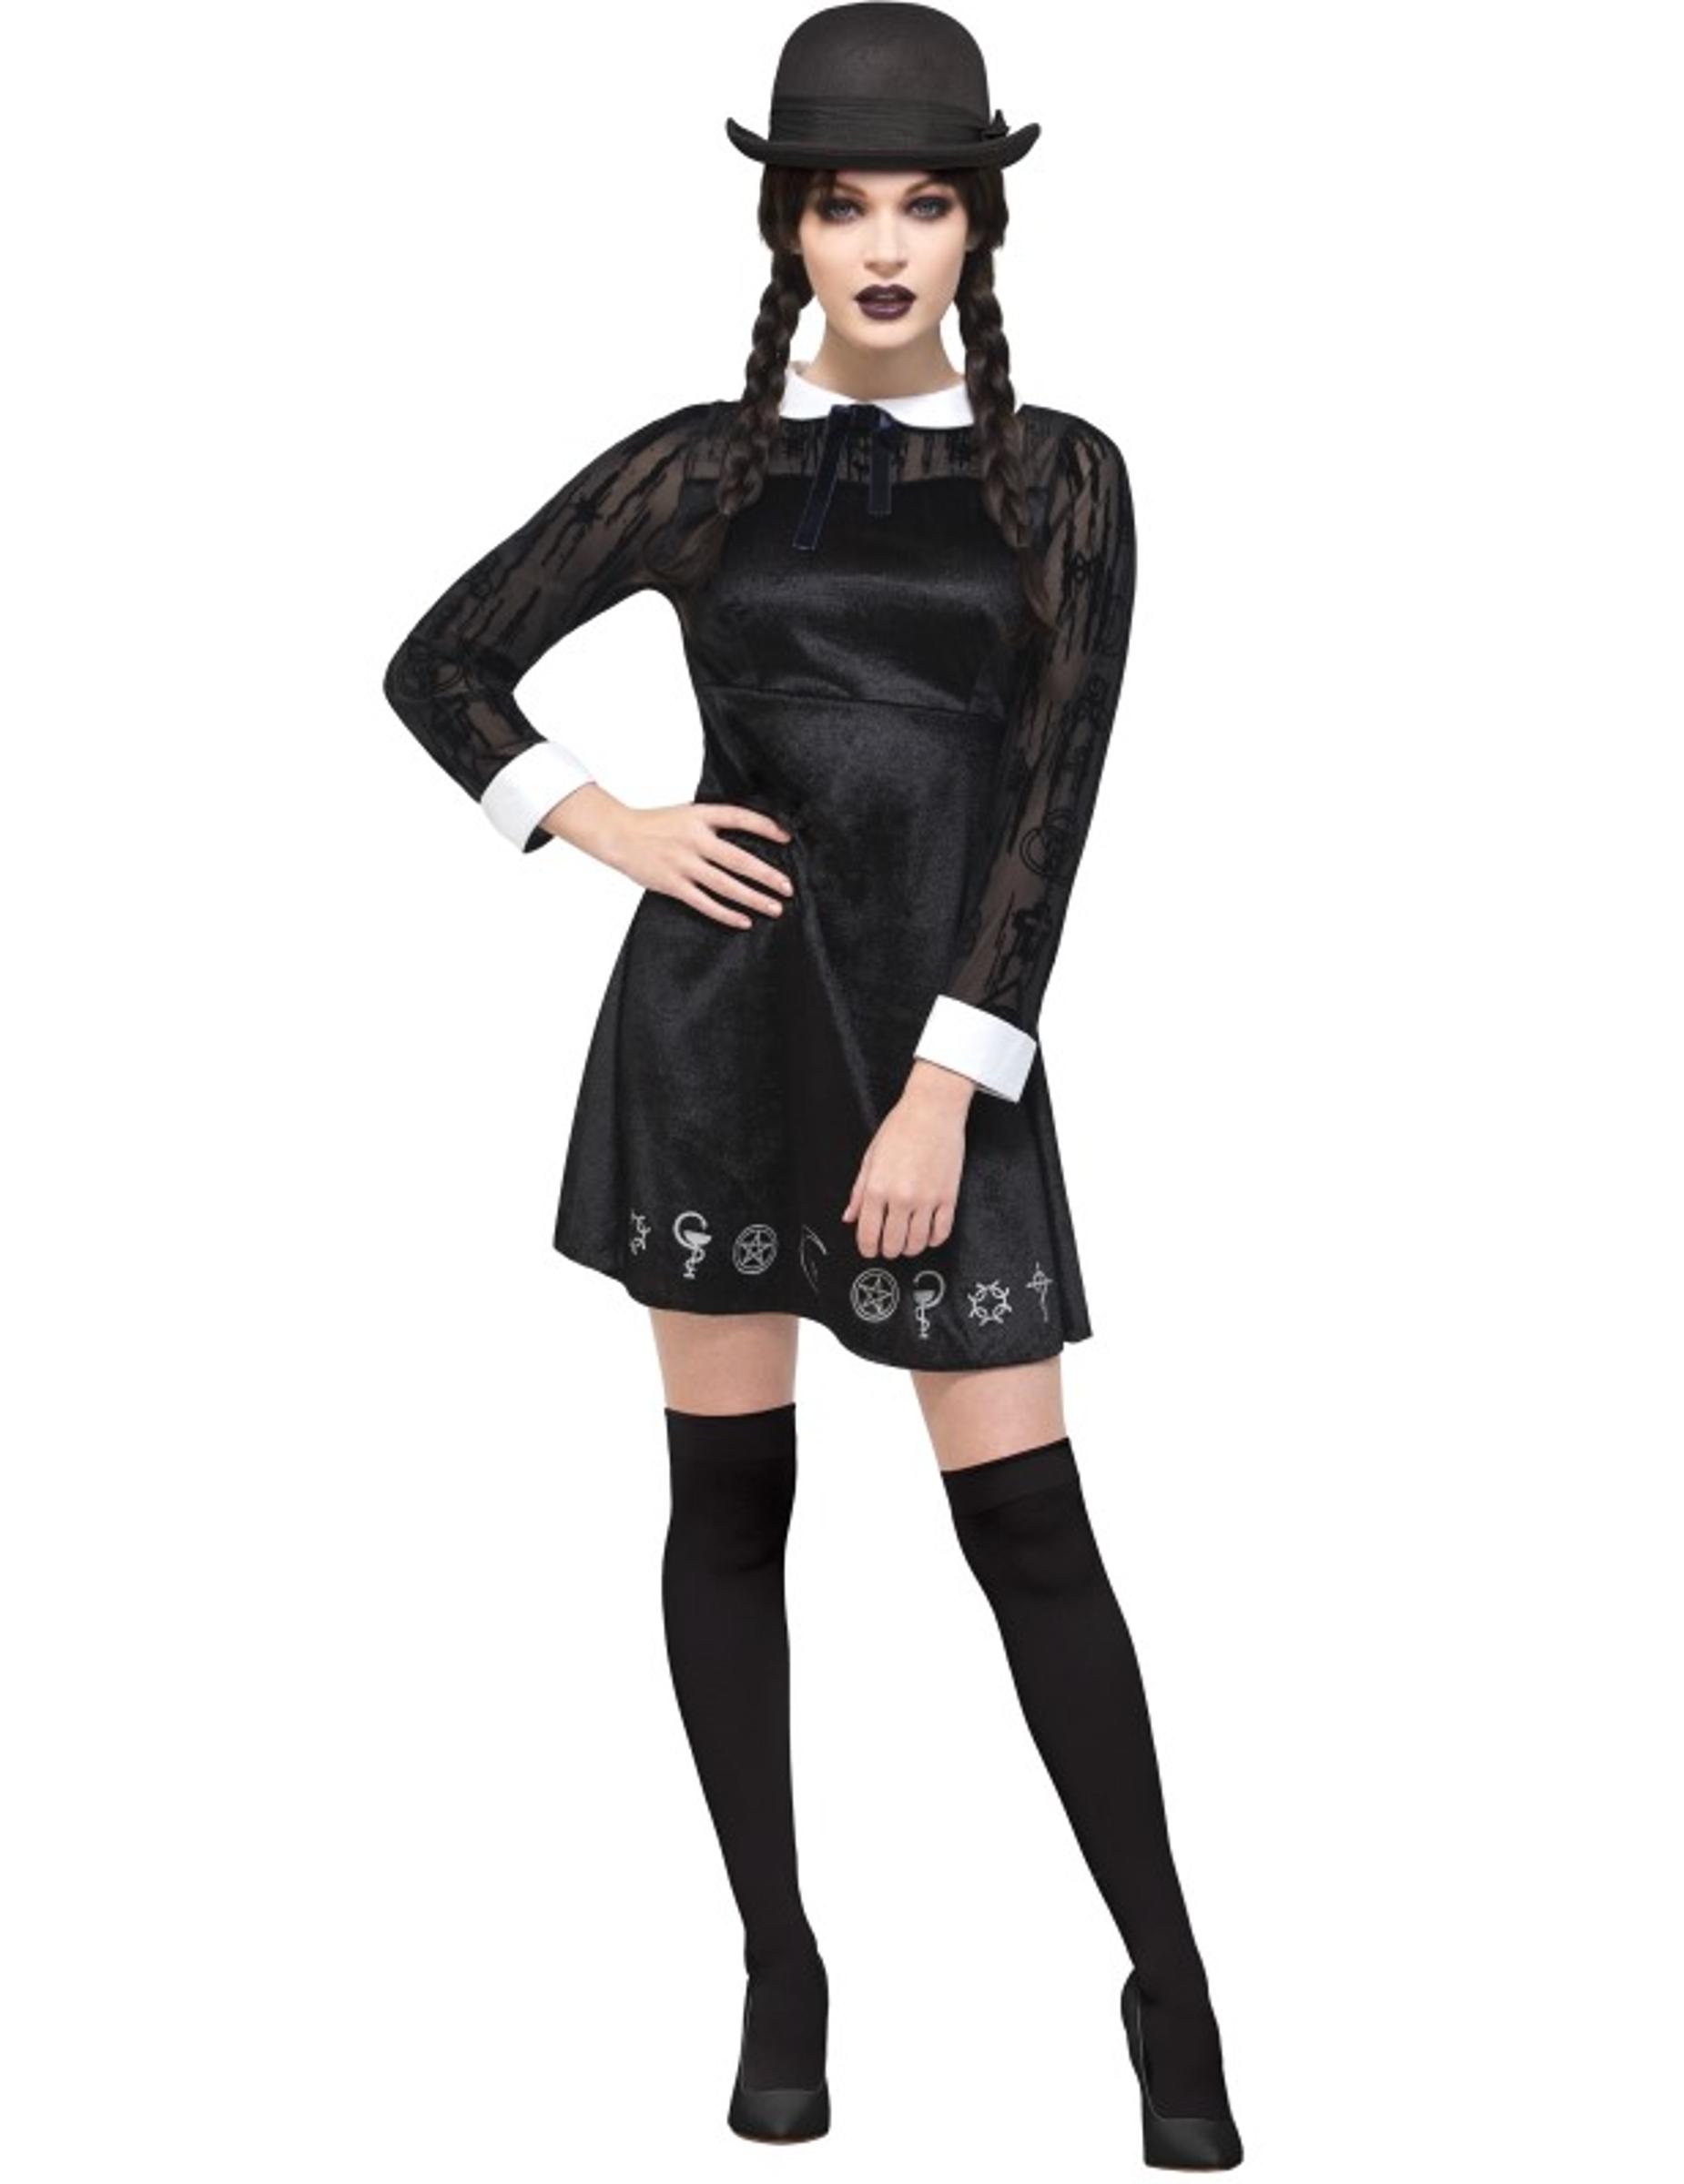 d guisement coli re gothique femme halloween deguise. Black Bedroom Furniture Sets. Home Design Ideas